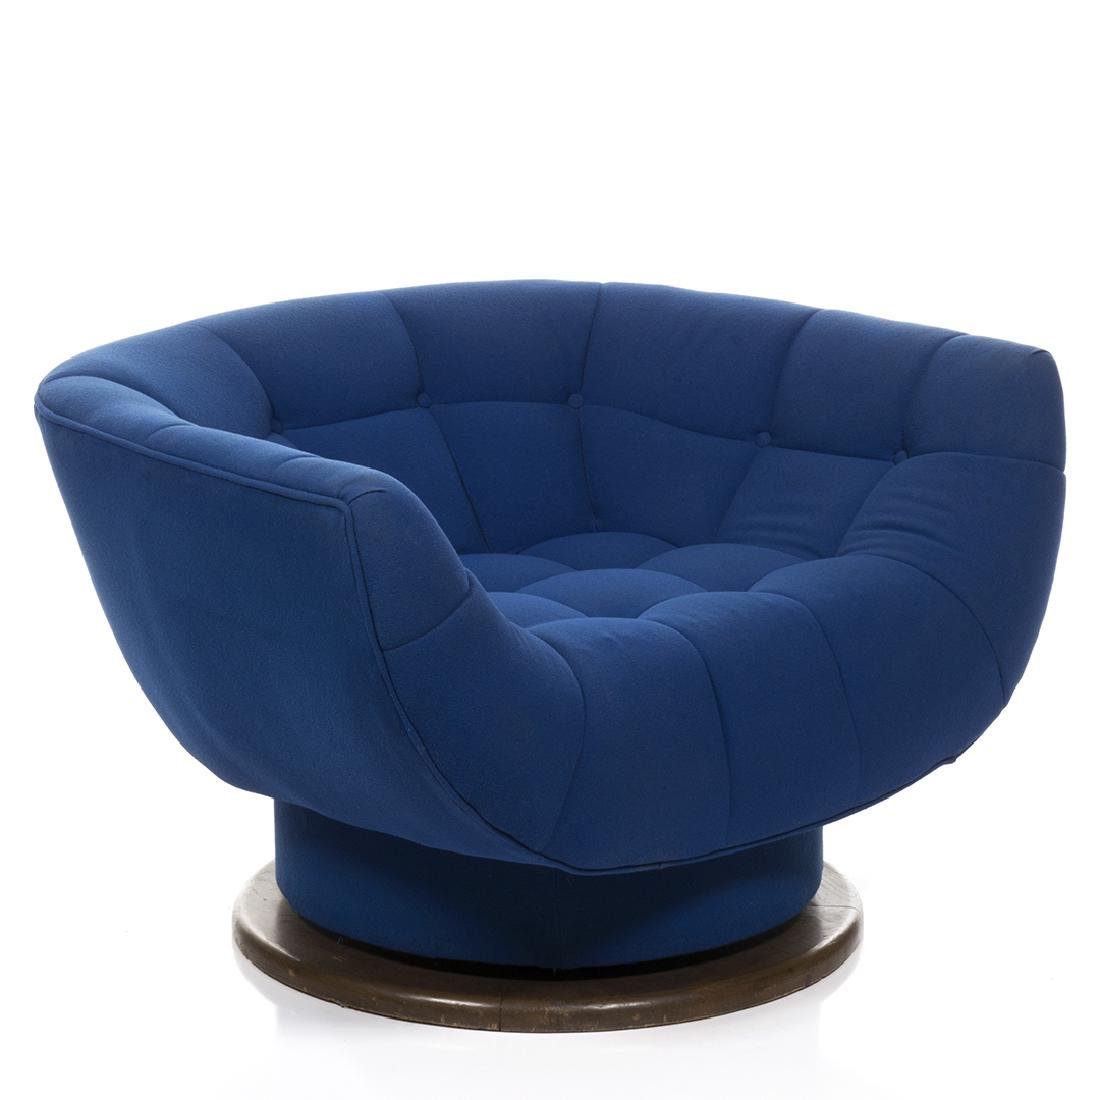 Monumental Adrian Pearsall Swivel Lounge Chair - 2